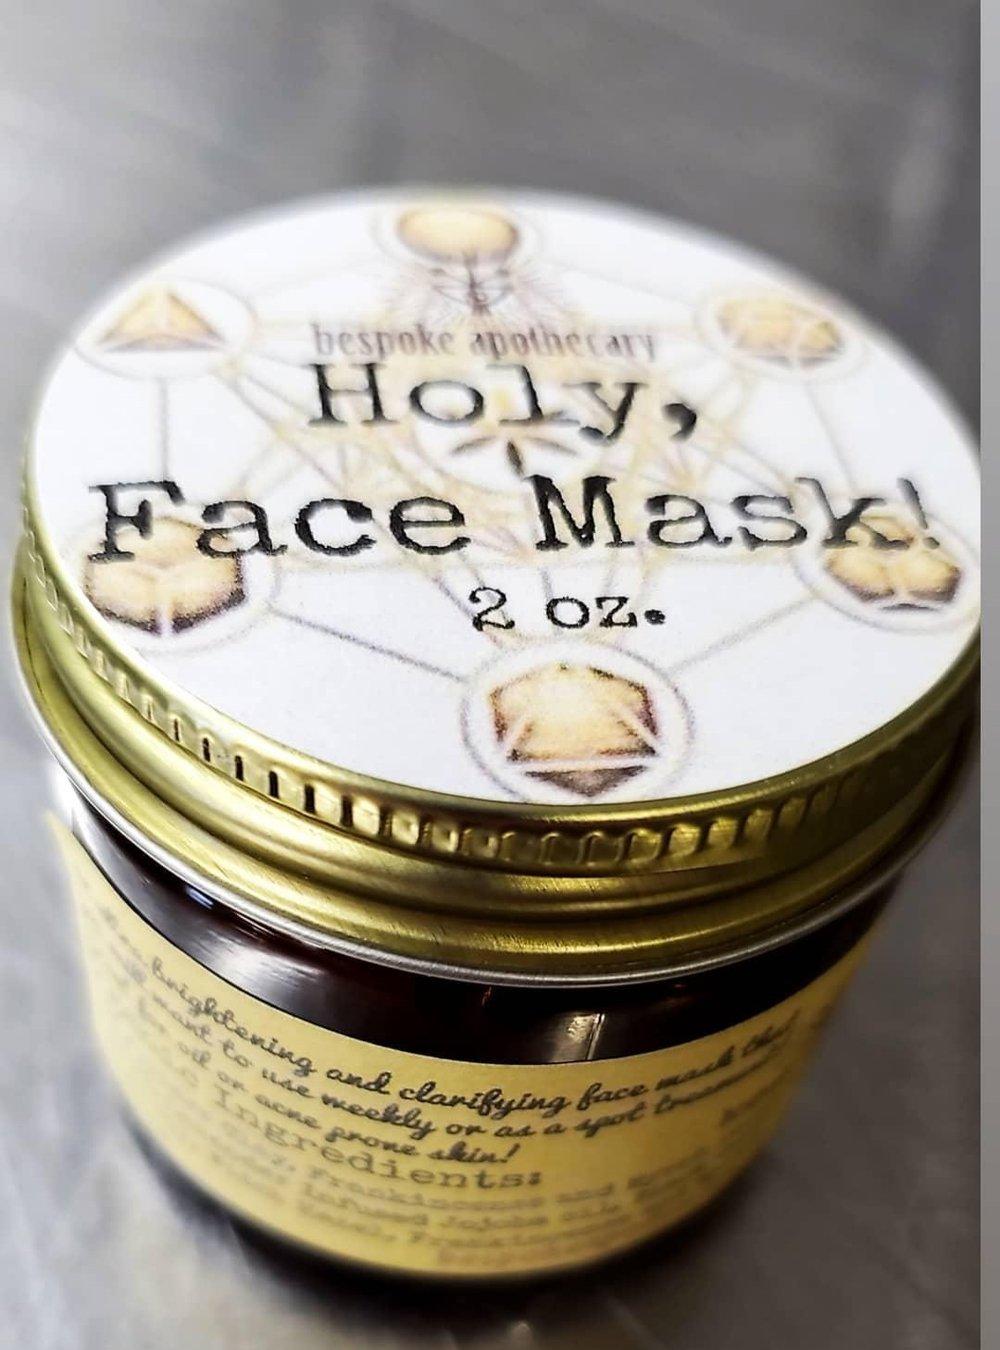 NEW & LIMITED BATCH Holy, Face Mask! (& Scrub)